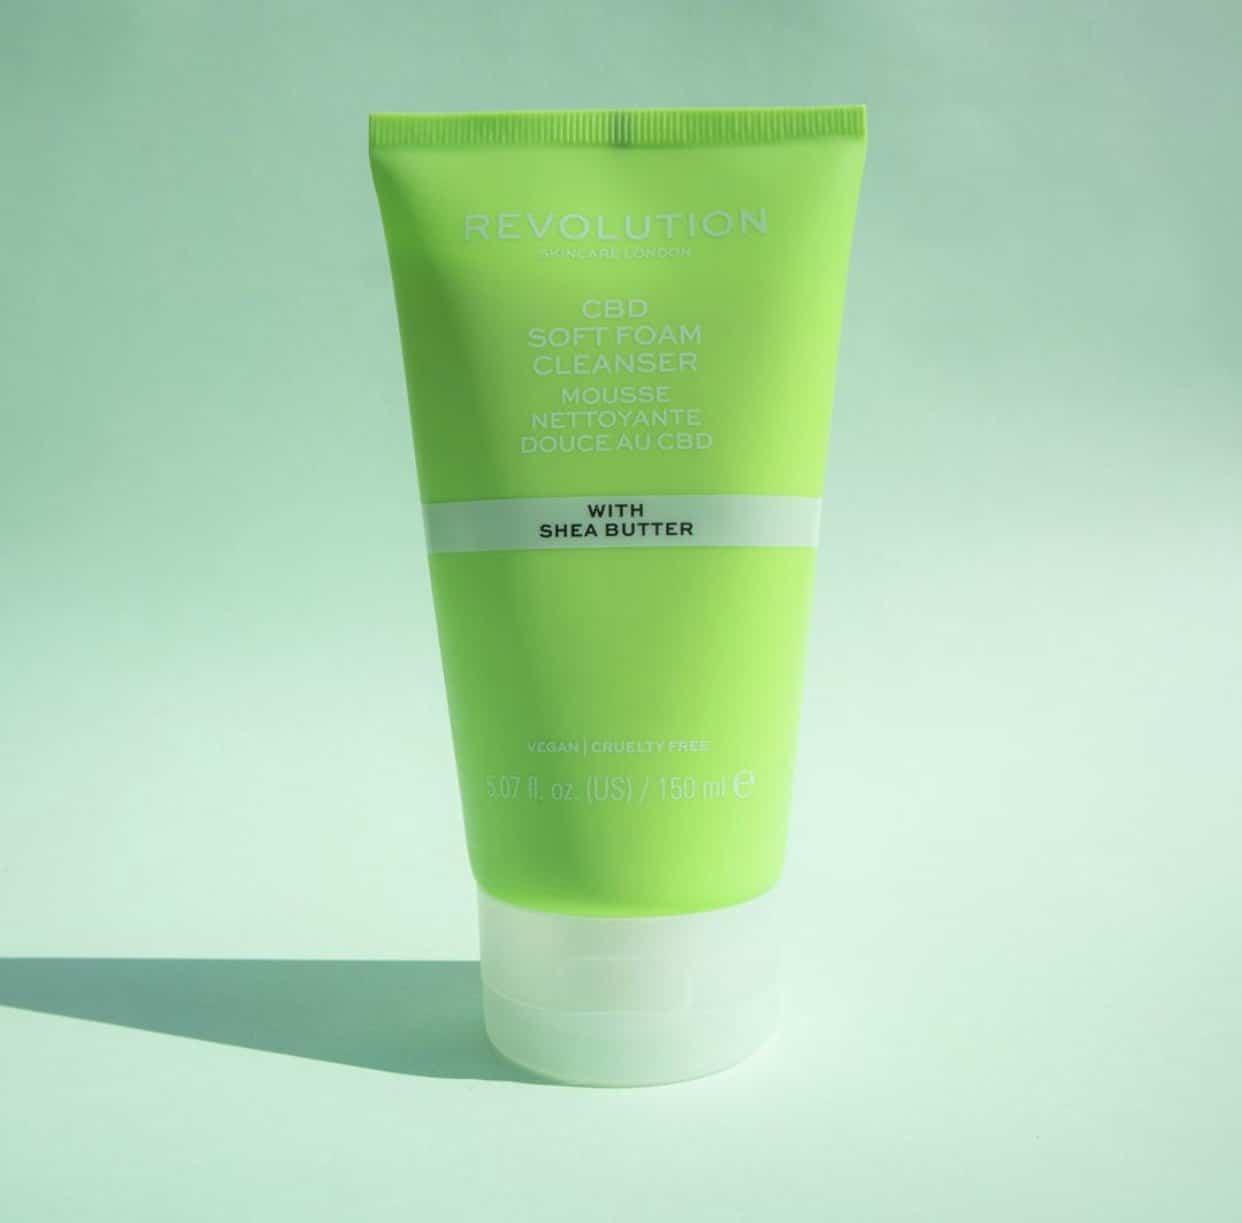 Revolution CBD Soft Foam Cleanser